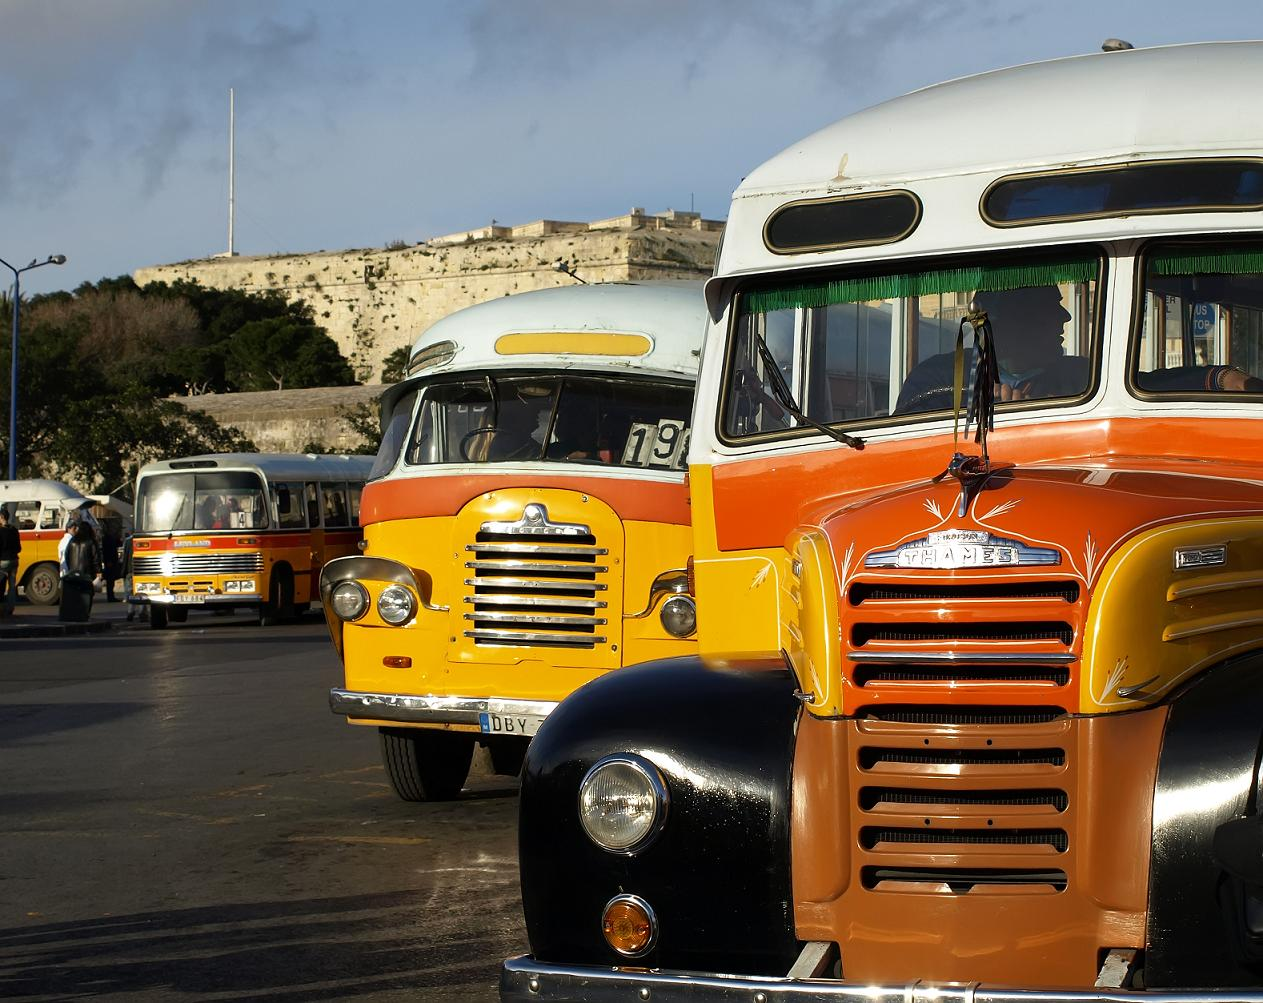 Аренда автомобиля на Мальте – Арриво